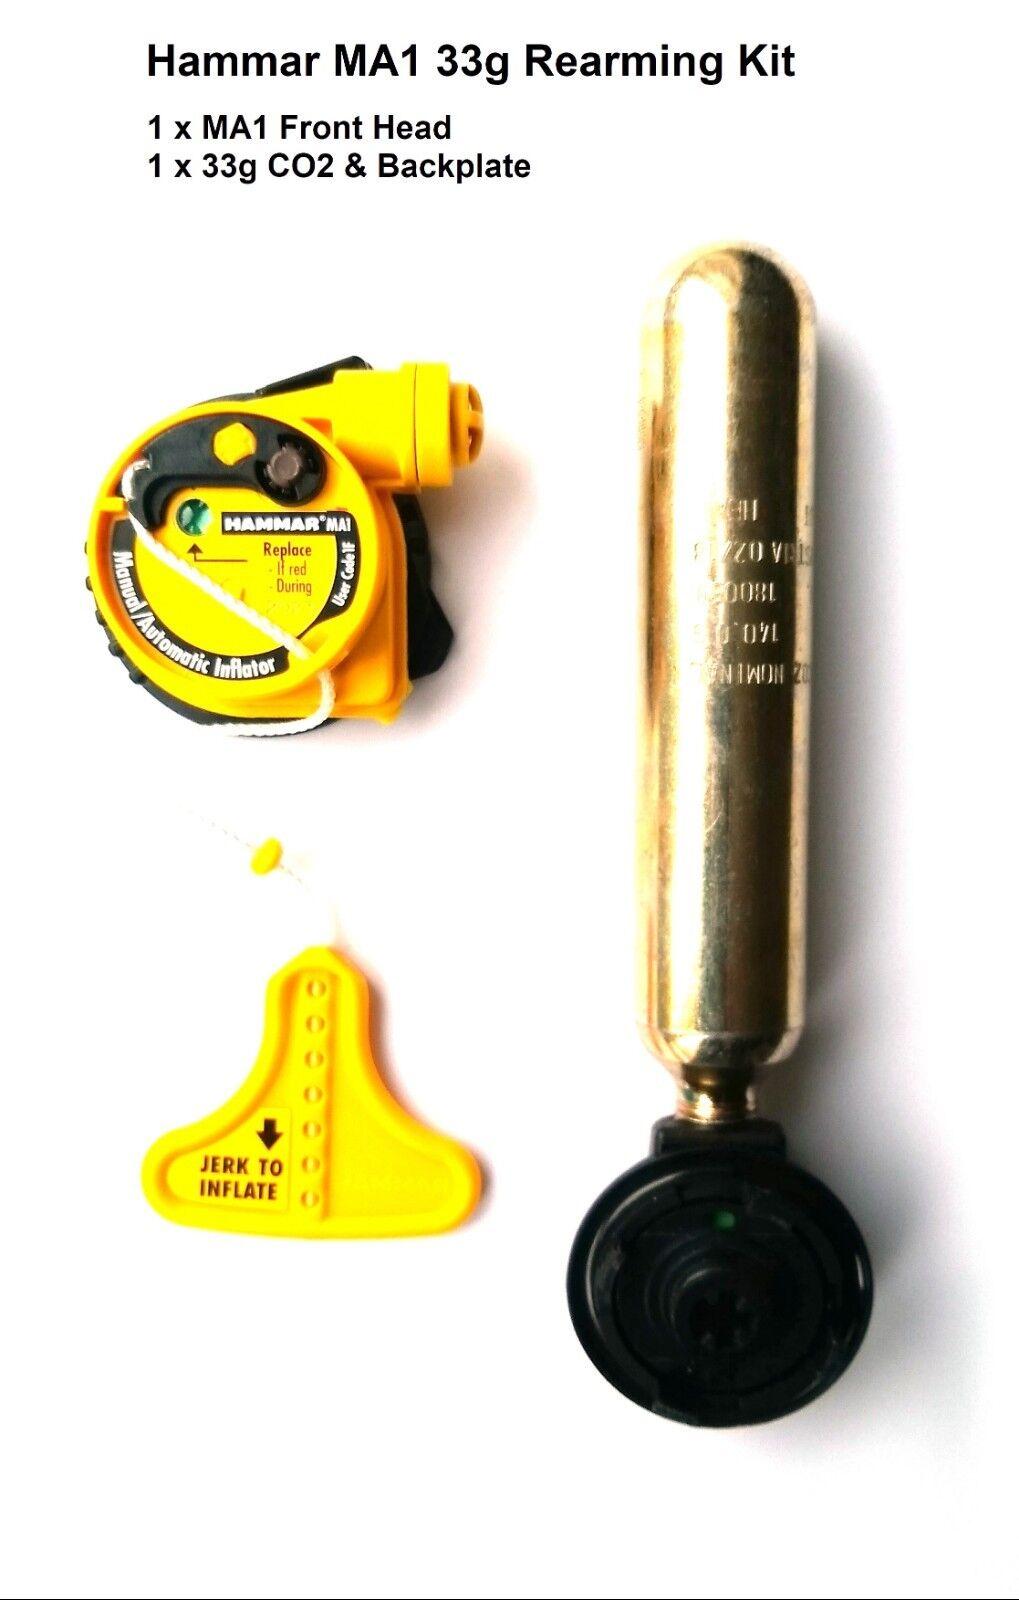 Hammar MA1 33g Rearming Kit